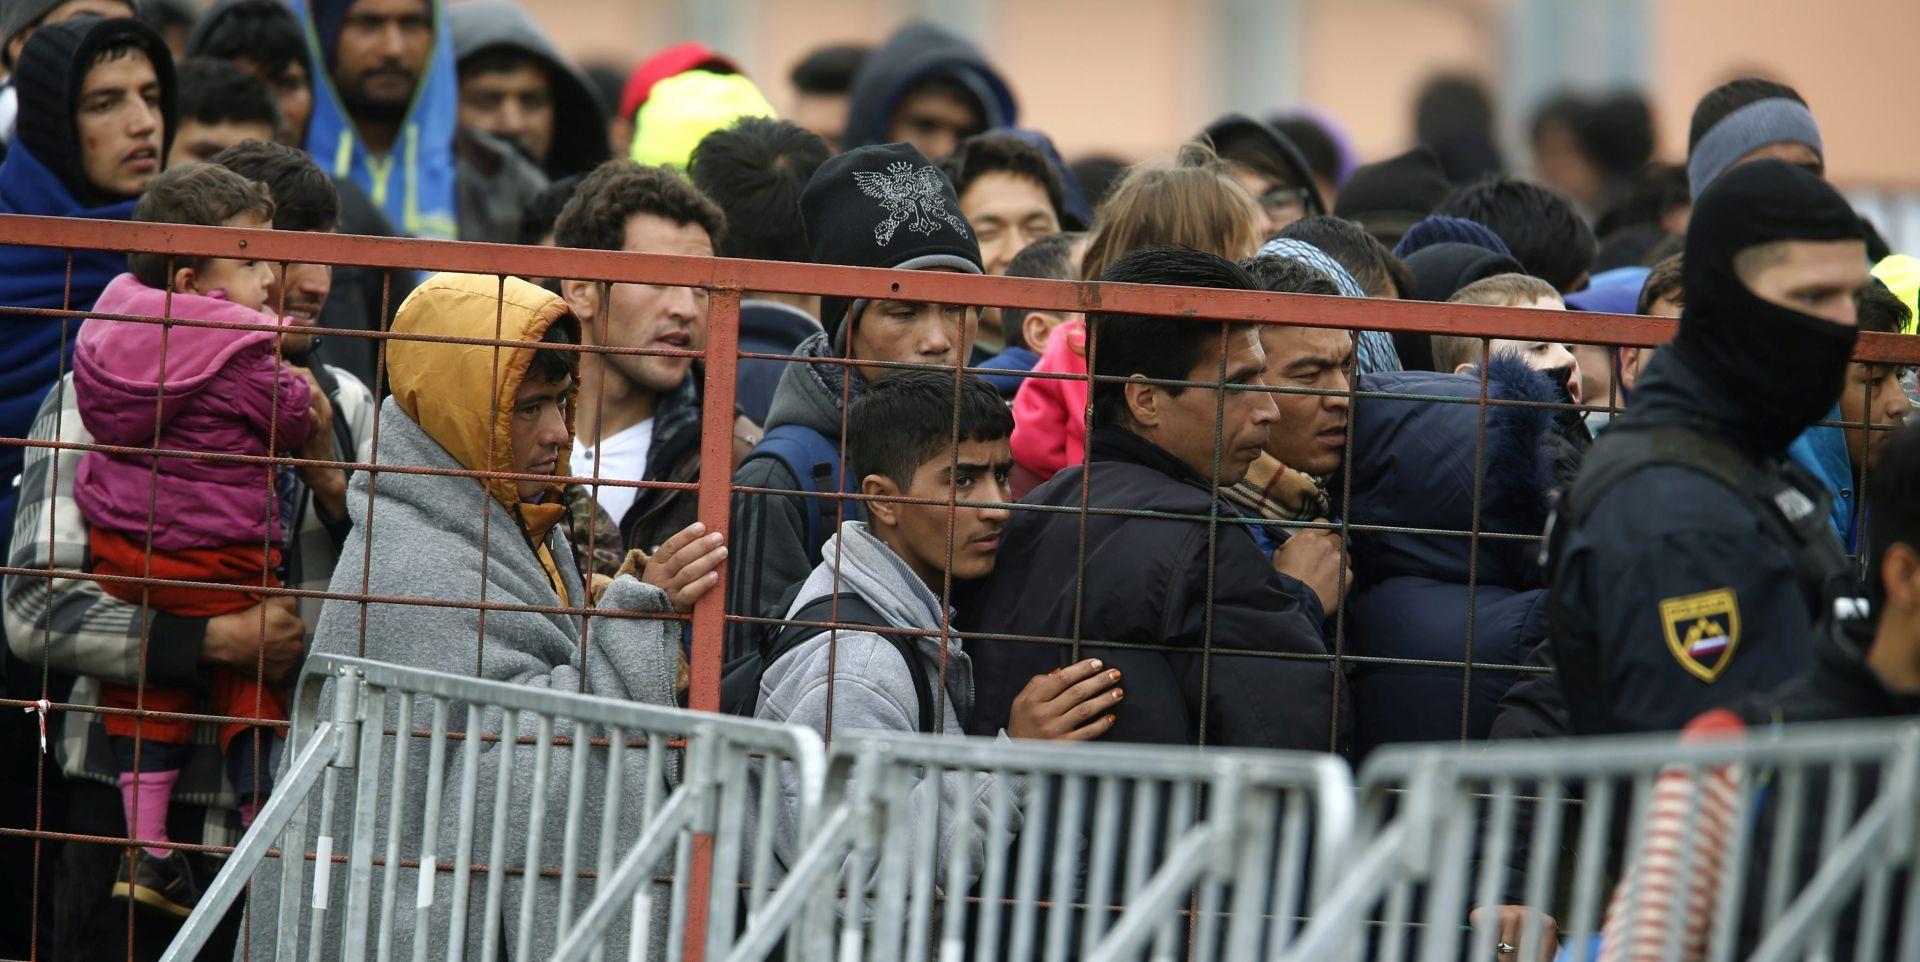 Slovenska vlada raspravljala o tehničkim preprekama za migrante, popodne kritično na Šentilju